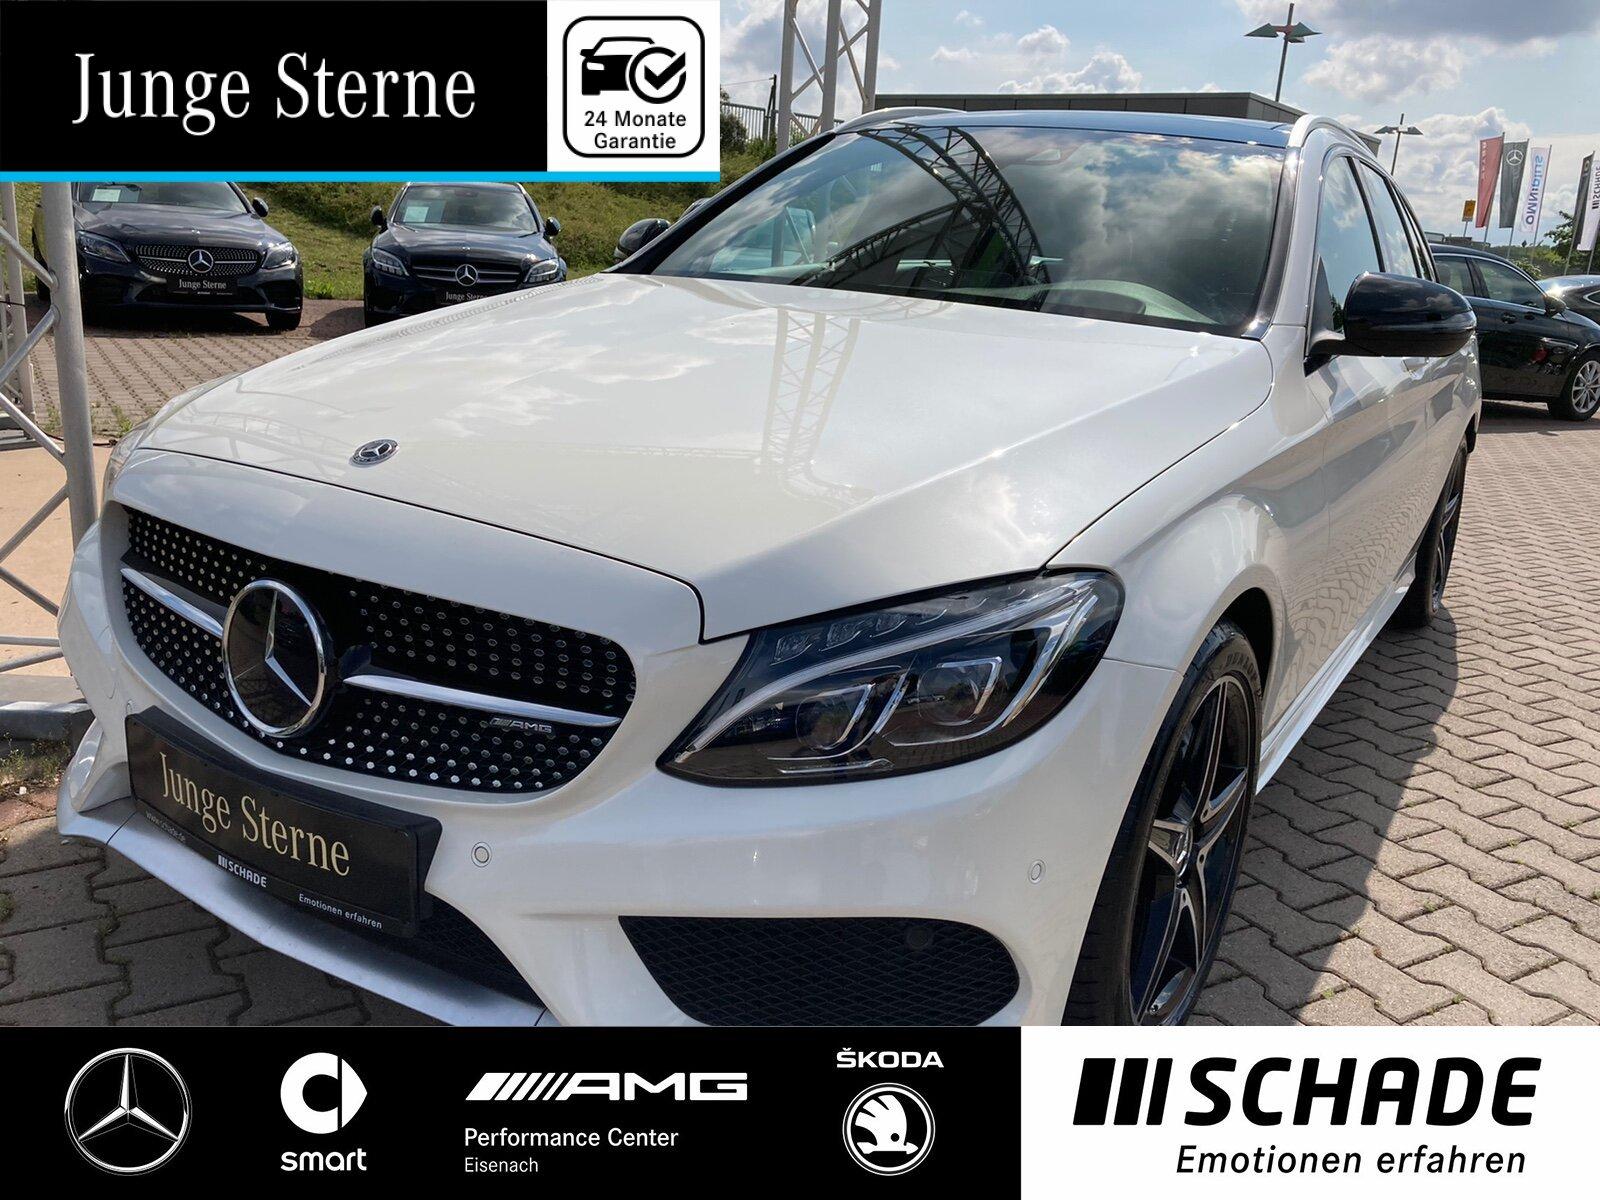 Mercedes-Benz C 43 AMG T 4M ILS*AHK*Head-Up*Panorama*Distronic, Jahr 2017, Benzin